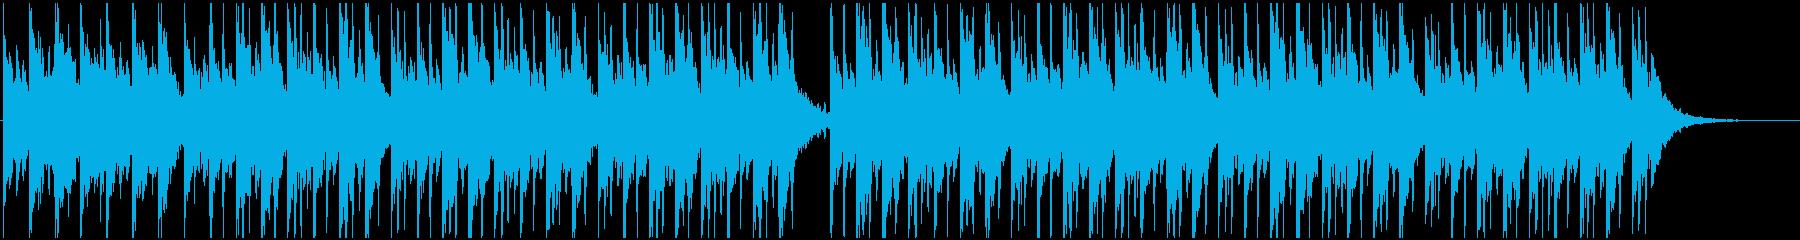 【LOFI HIPHOP】深夜勉強用Cの再生済みの波形